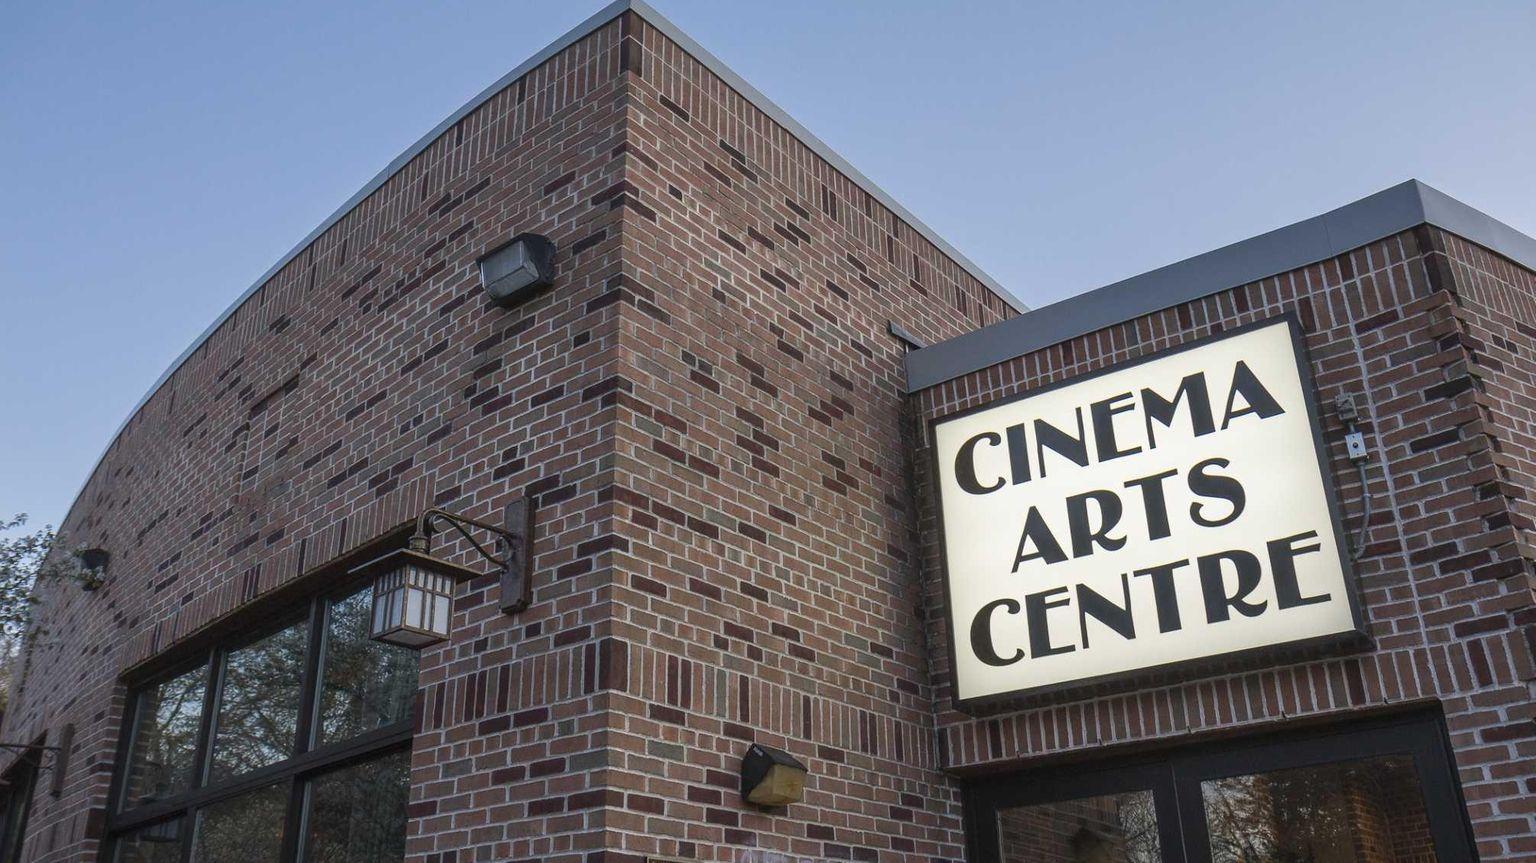 Cinema Arts Centre